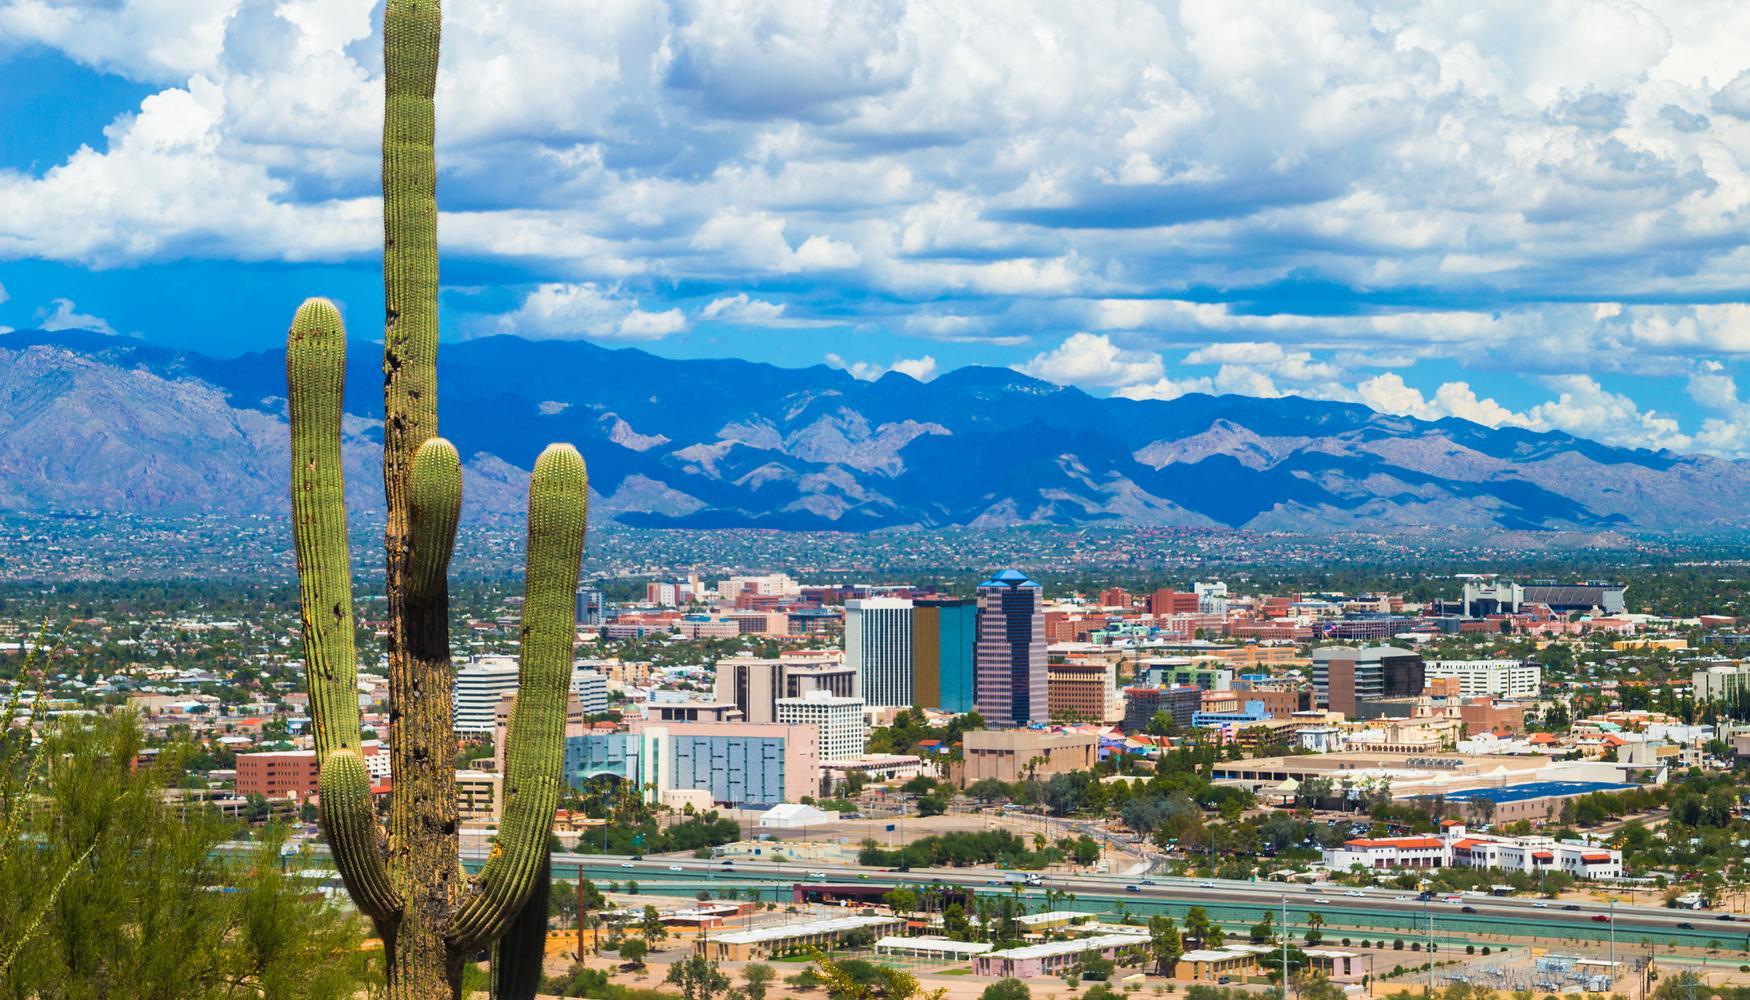 Carros de aluguer em Aeroporto de Tucson